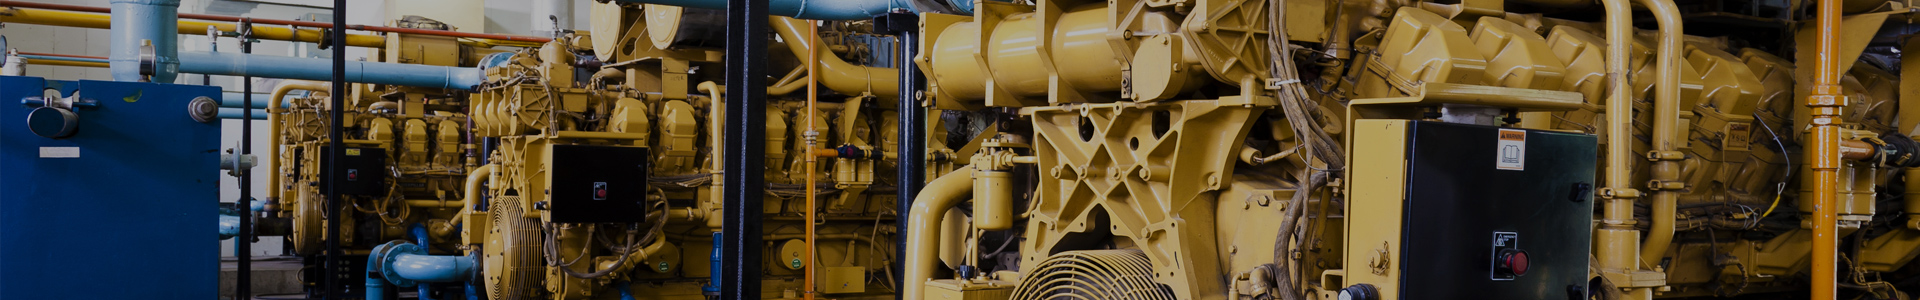 Emergency Back Up Generators In Stock